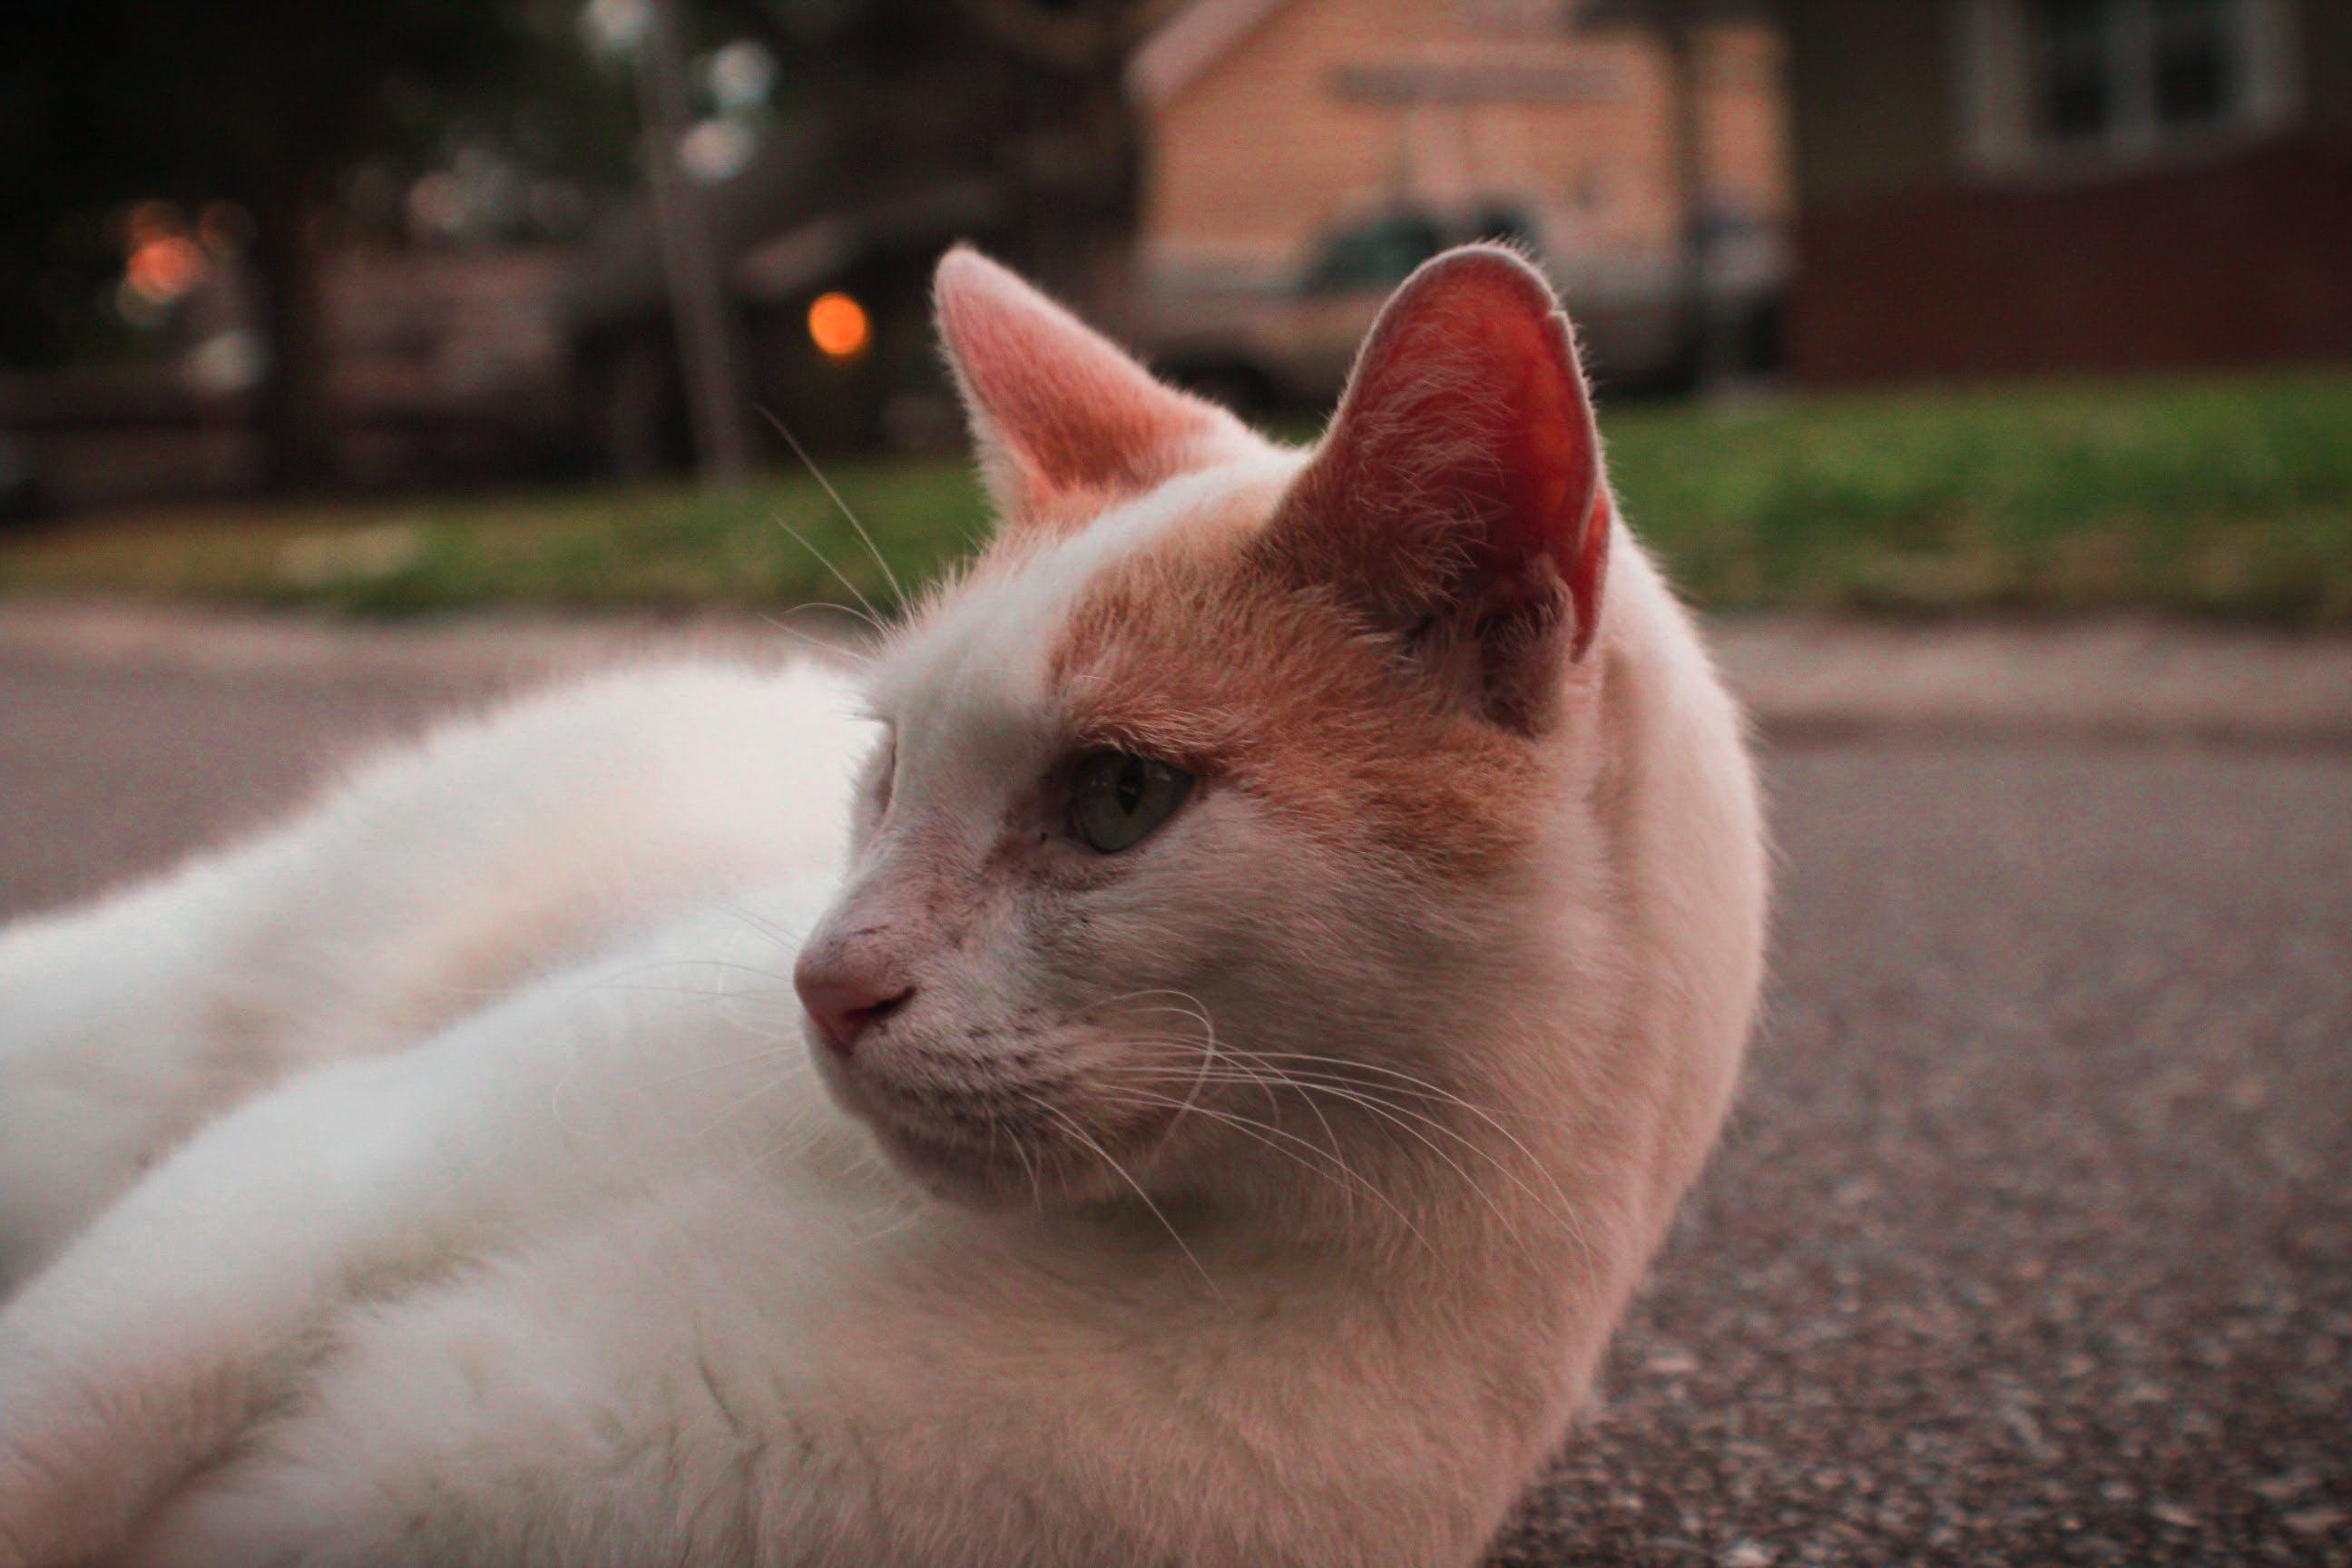 White and Orange Cat Lying on Pavement